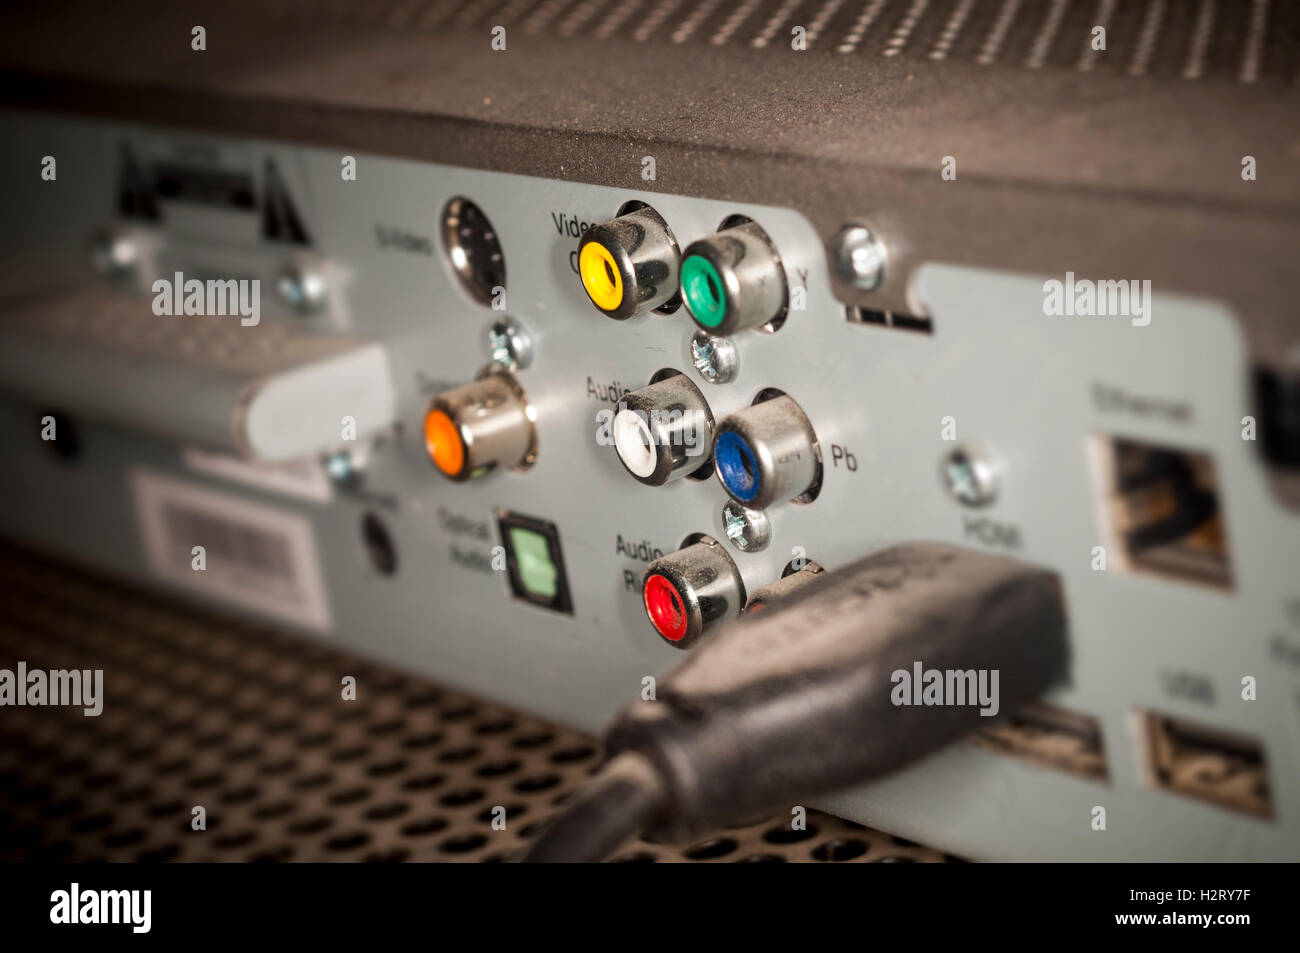 Verizon Fios Stock Photos & Verizon Fios Stock Images - Alamy